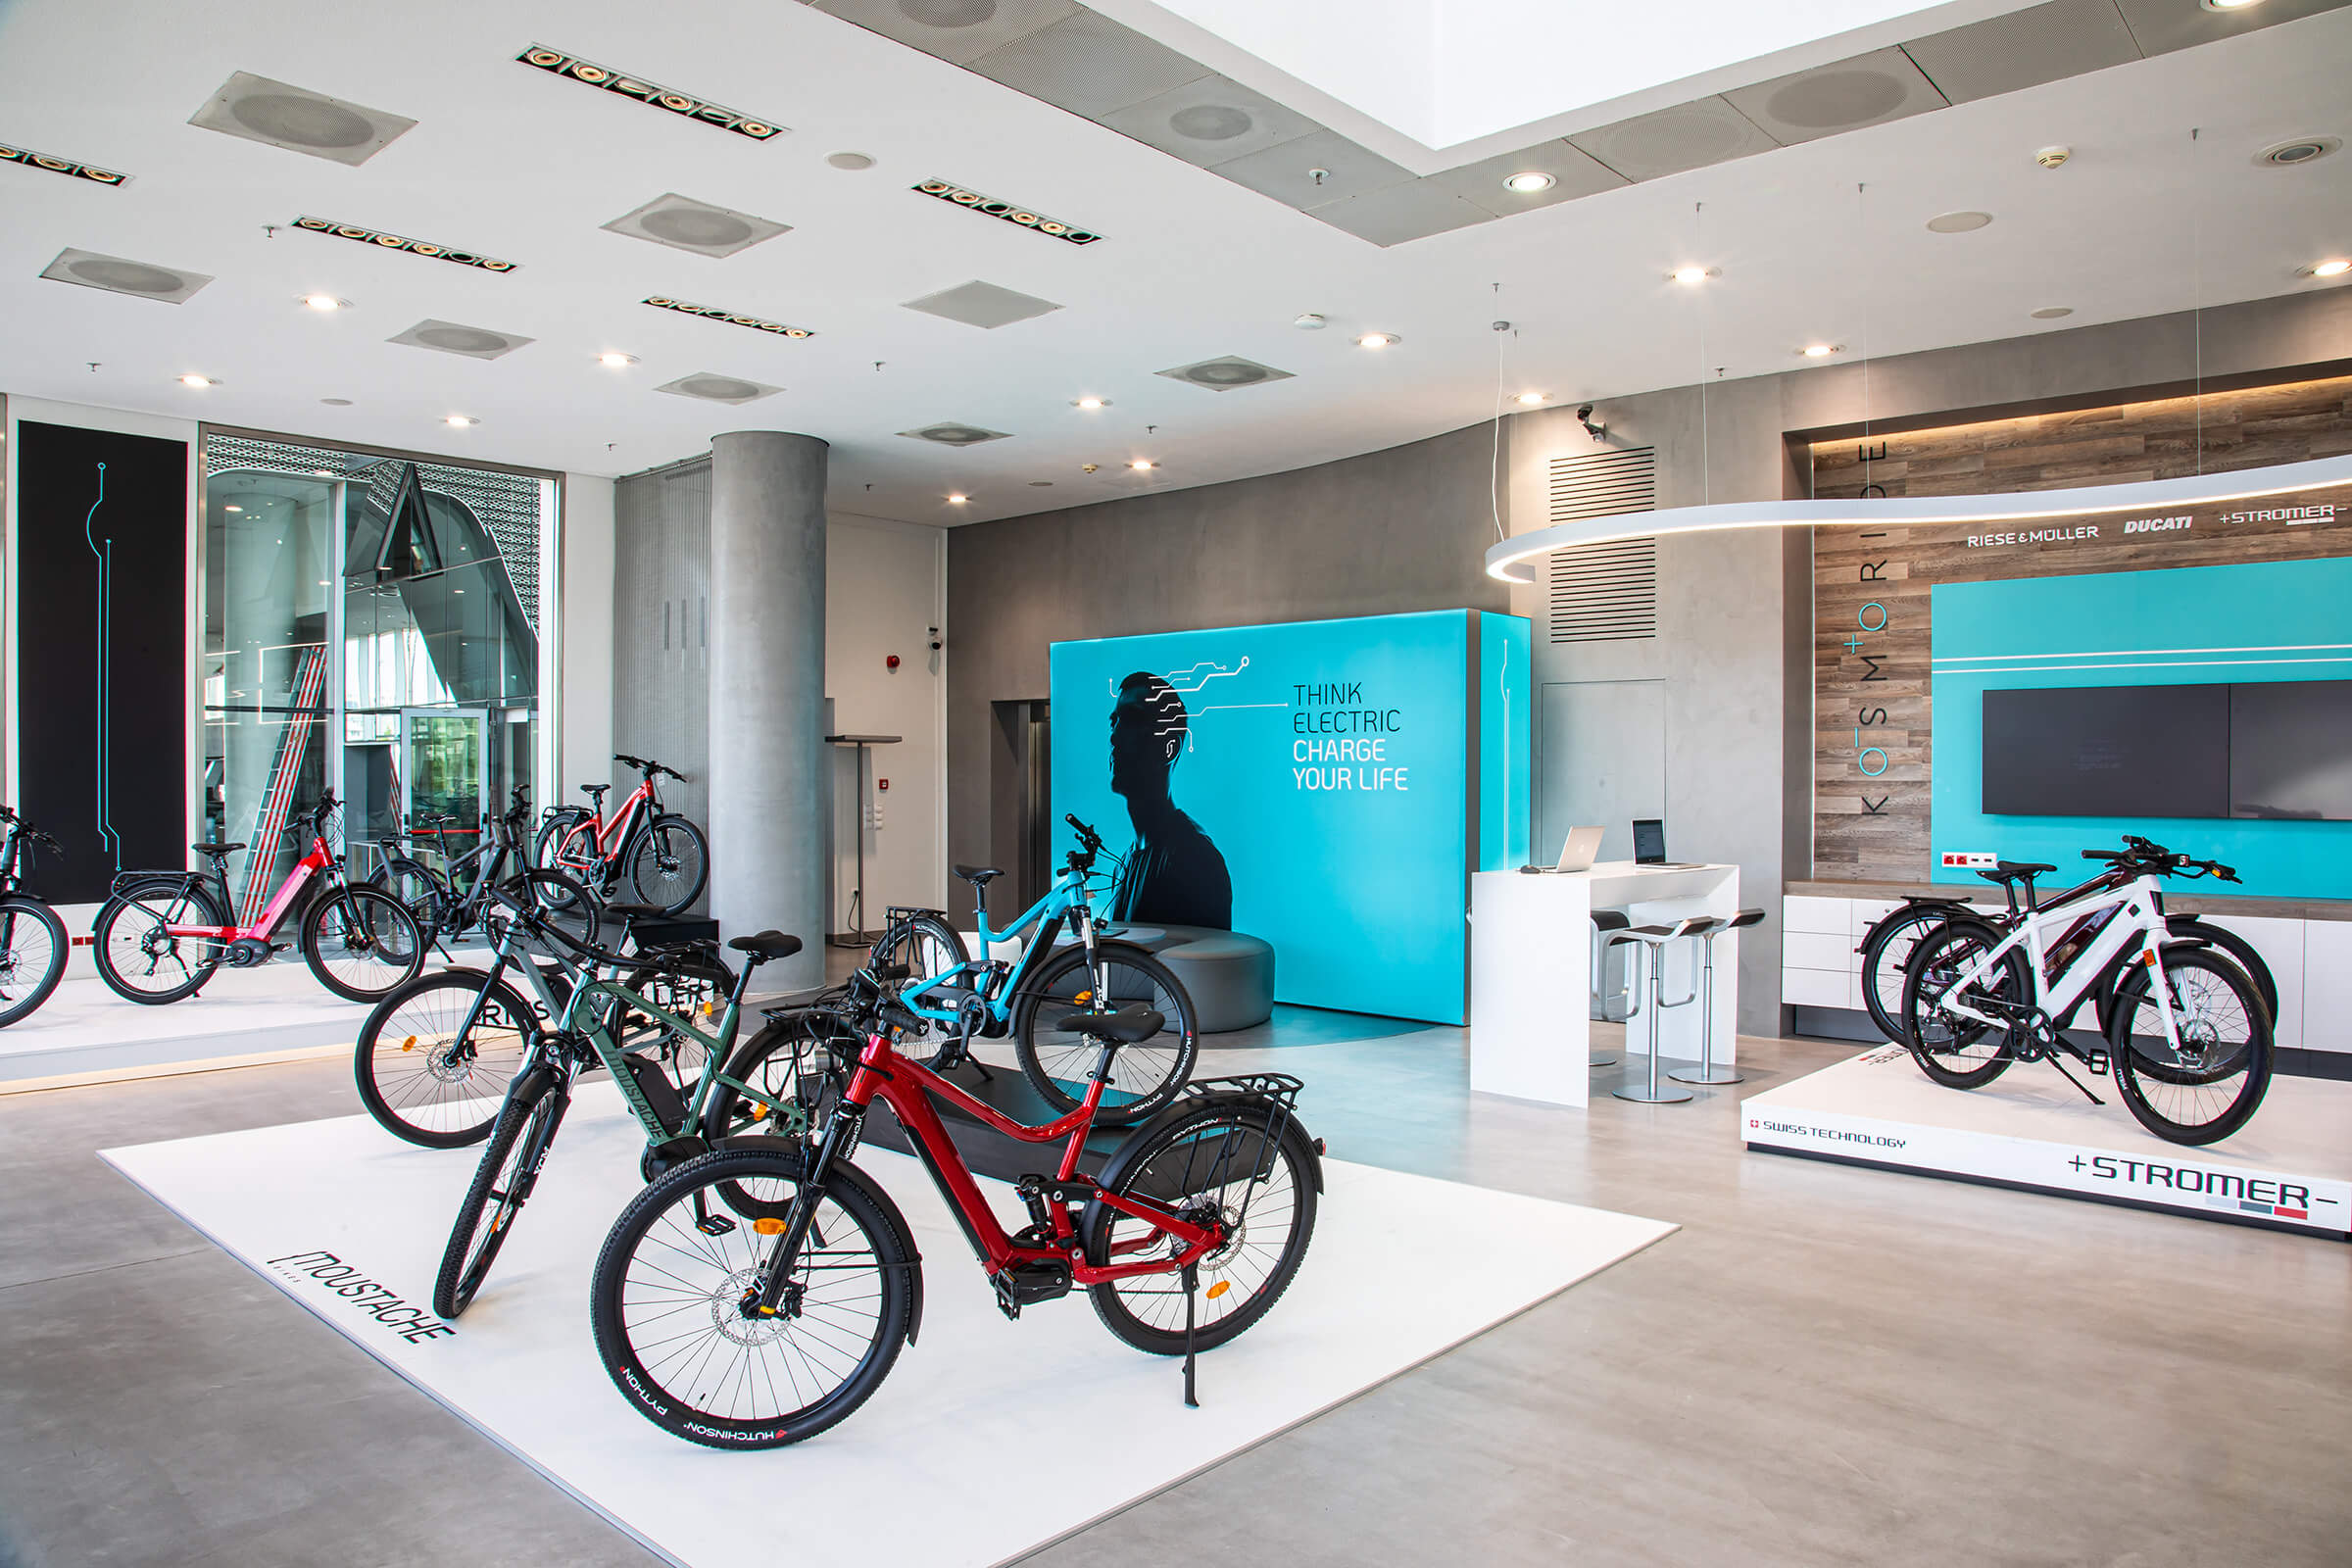 Kosmoride e-Bikes experience store - Εσωτερικός χώρος καταστήματος ηλεκτρικών ποδηλάτων στο Μαρούσι